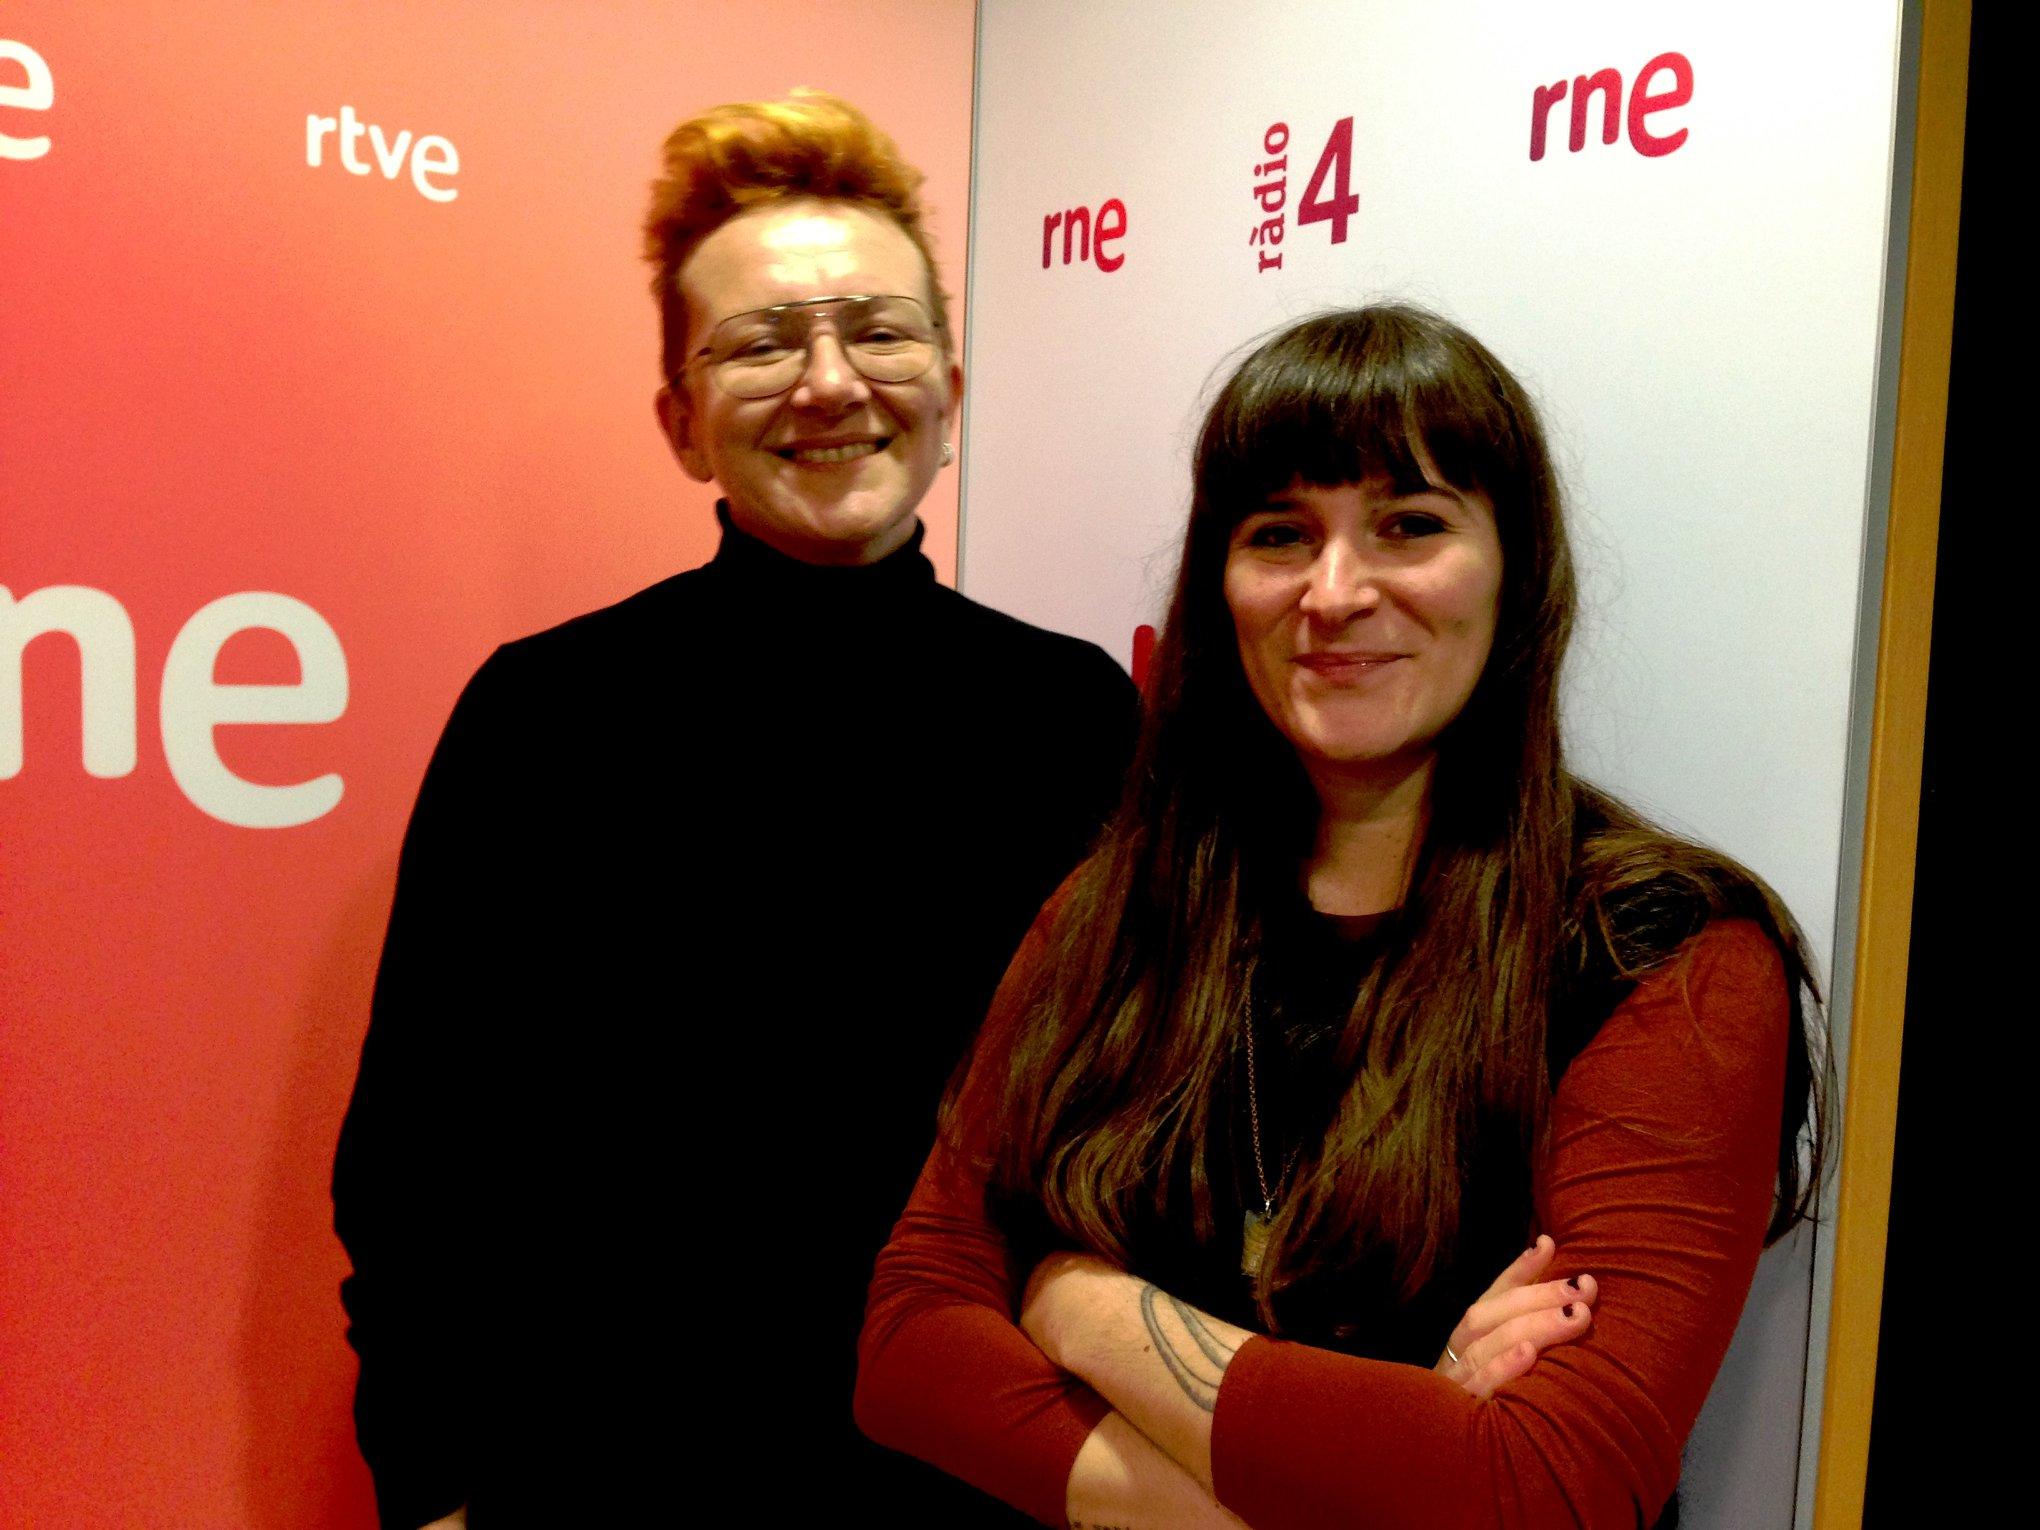 La Mostra Interacional Films Dones Barcelona a Feminismes RN4 03 Marta Nieto Brigitte Vasallo Top of the Lake